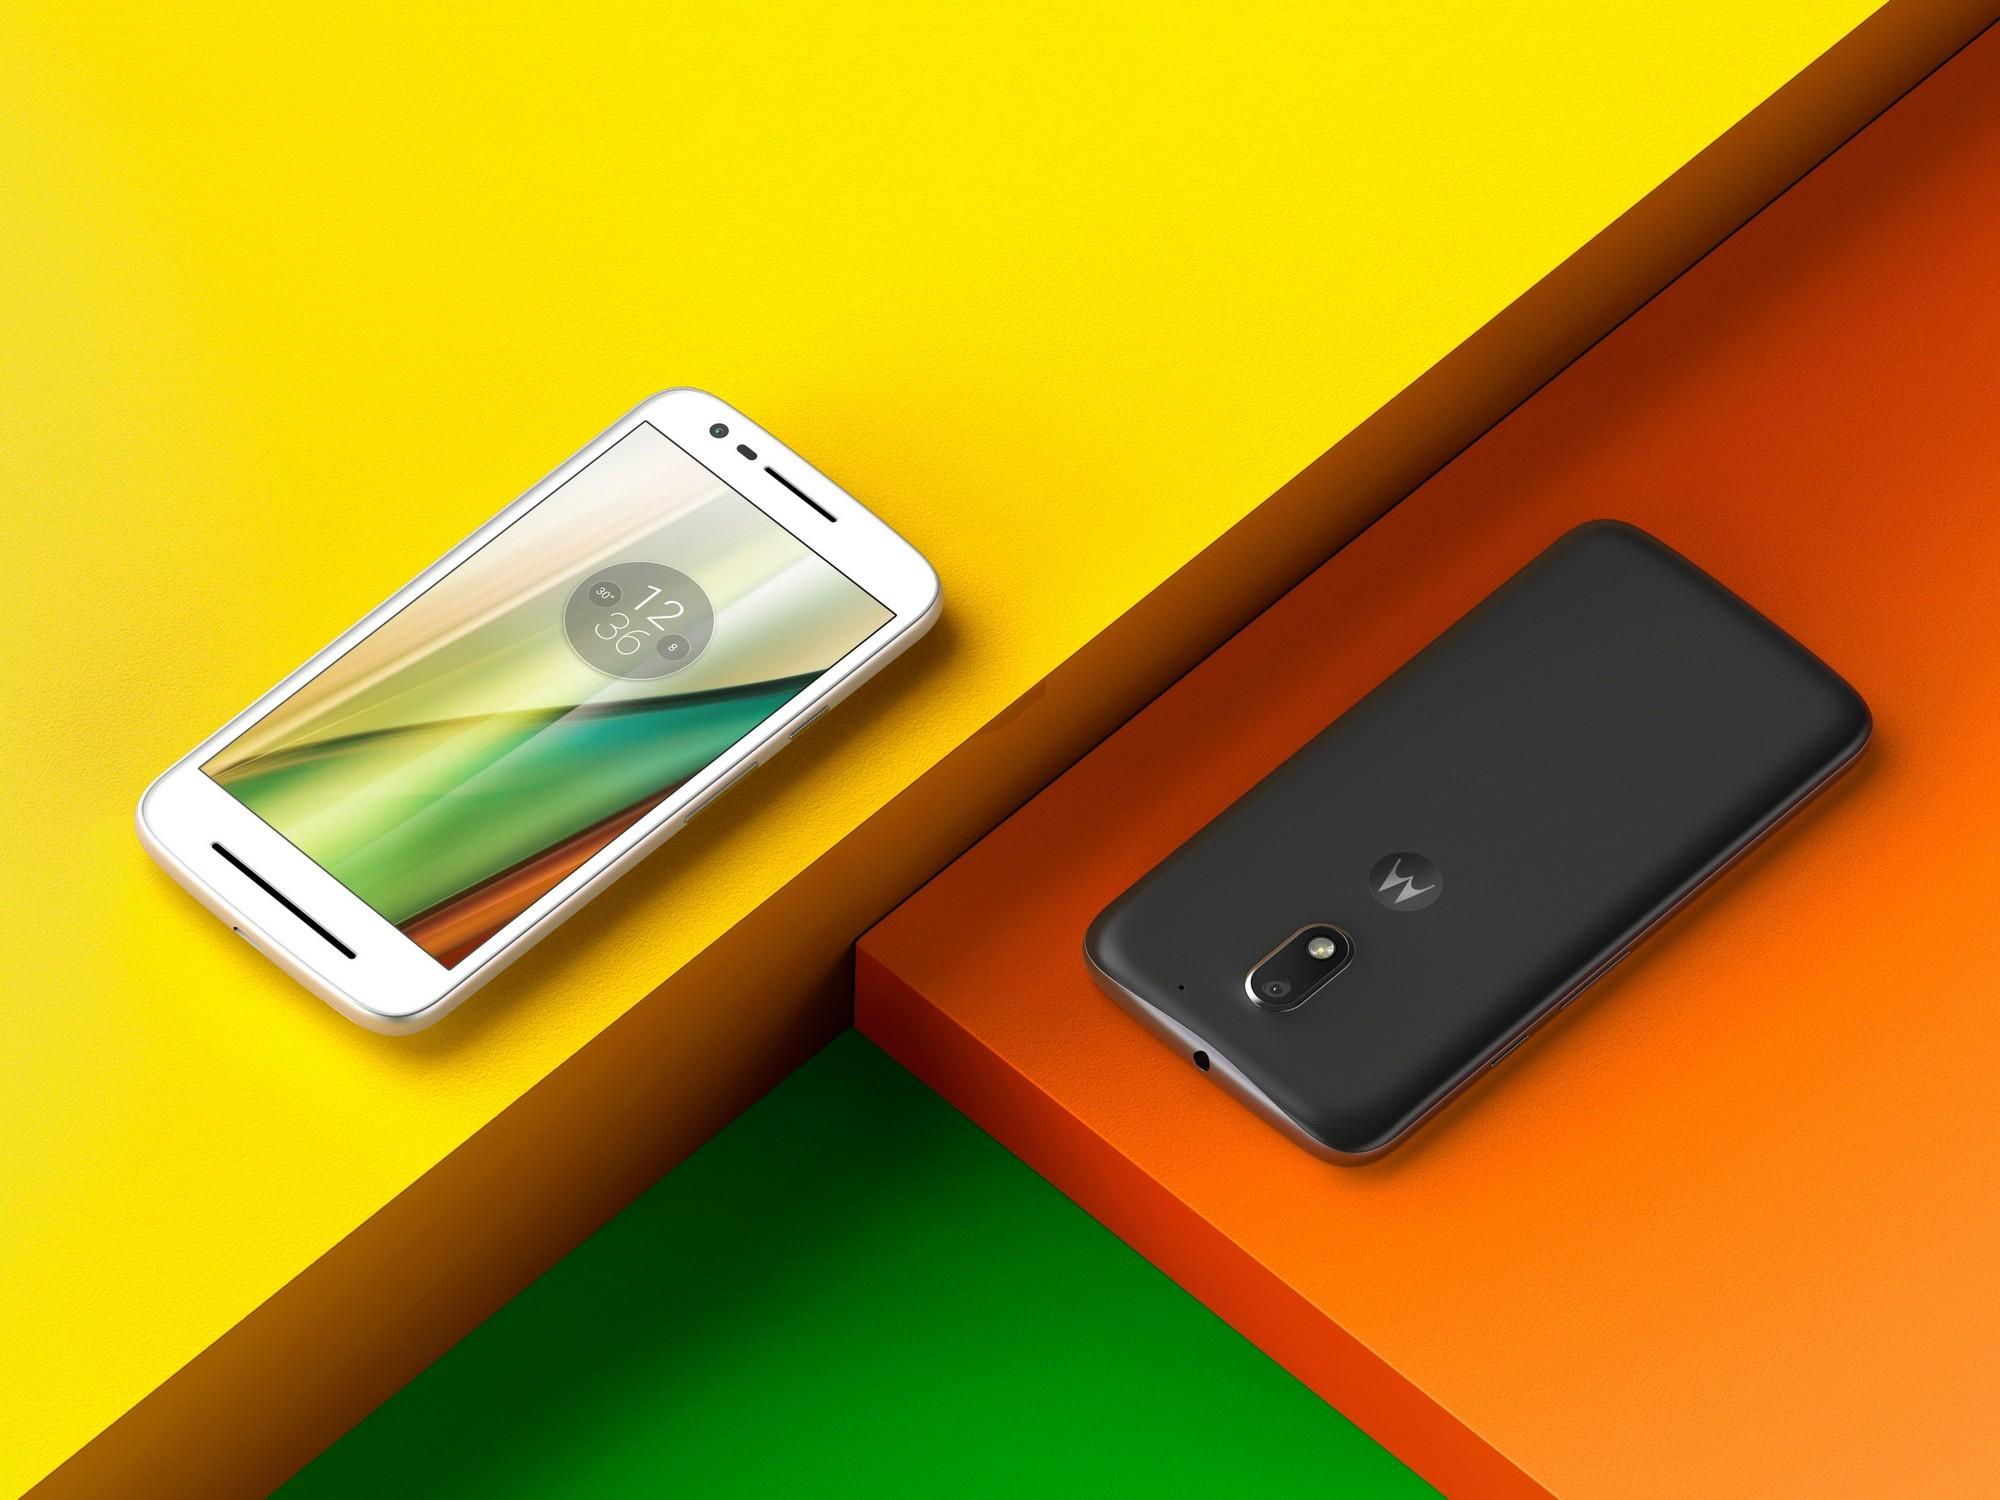 Motorola Moto E4 и Moto E4 Plus с батареей на 5000 мА/ч получили сертификат FCC